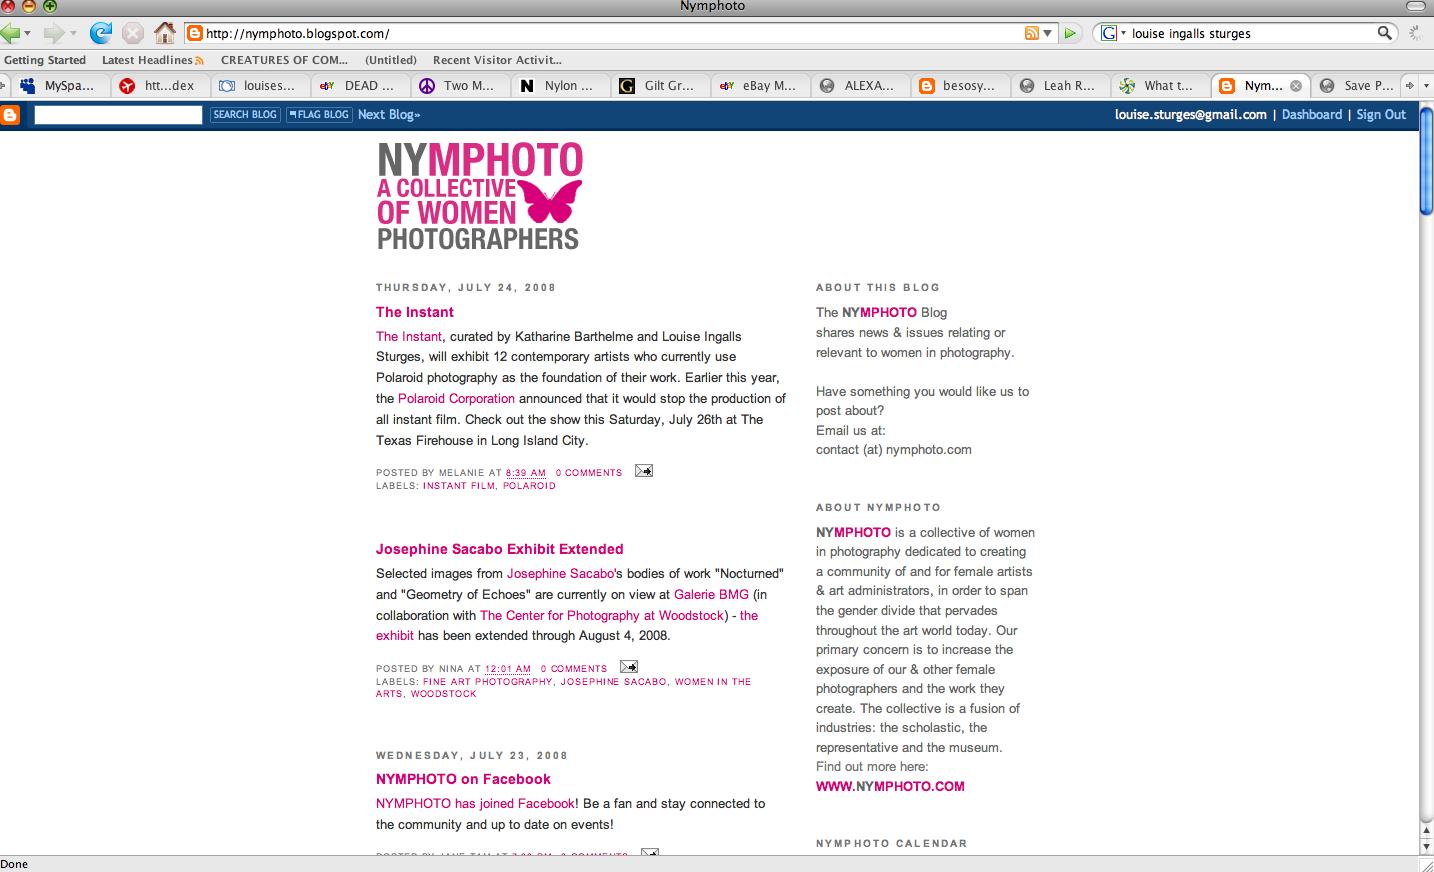 NYMPHOTO Online